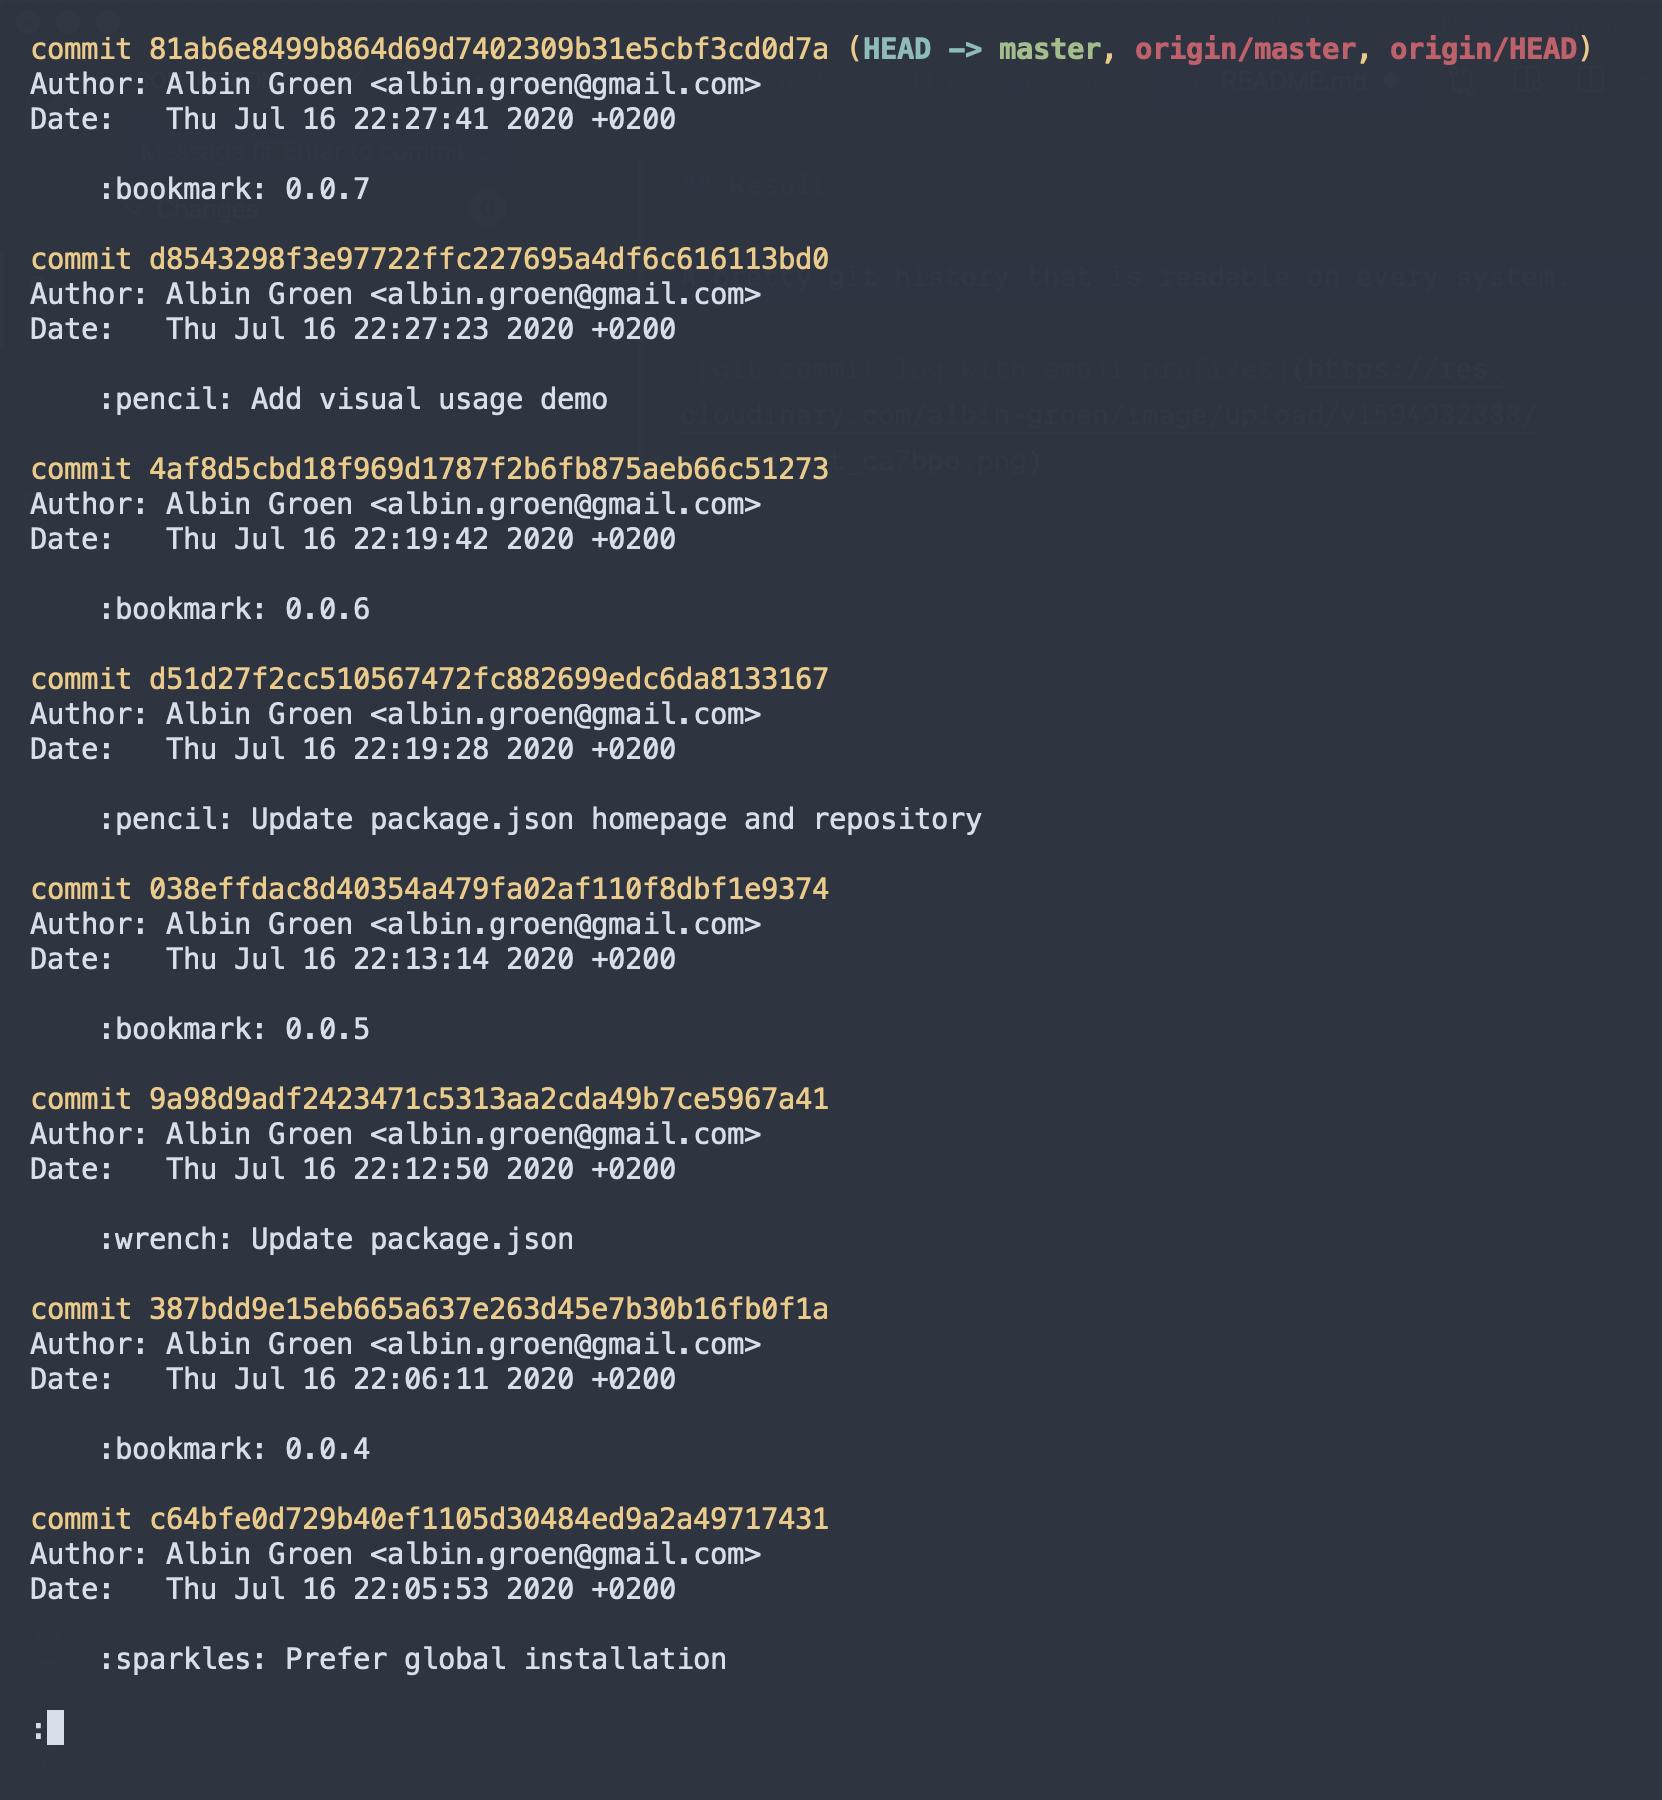 git commit log cli with textual emoji prefixes